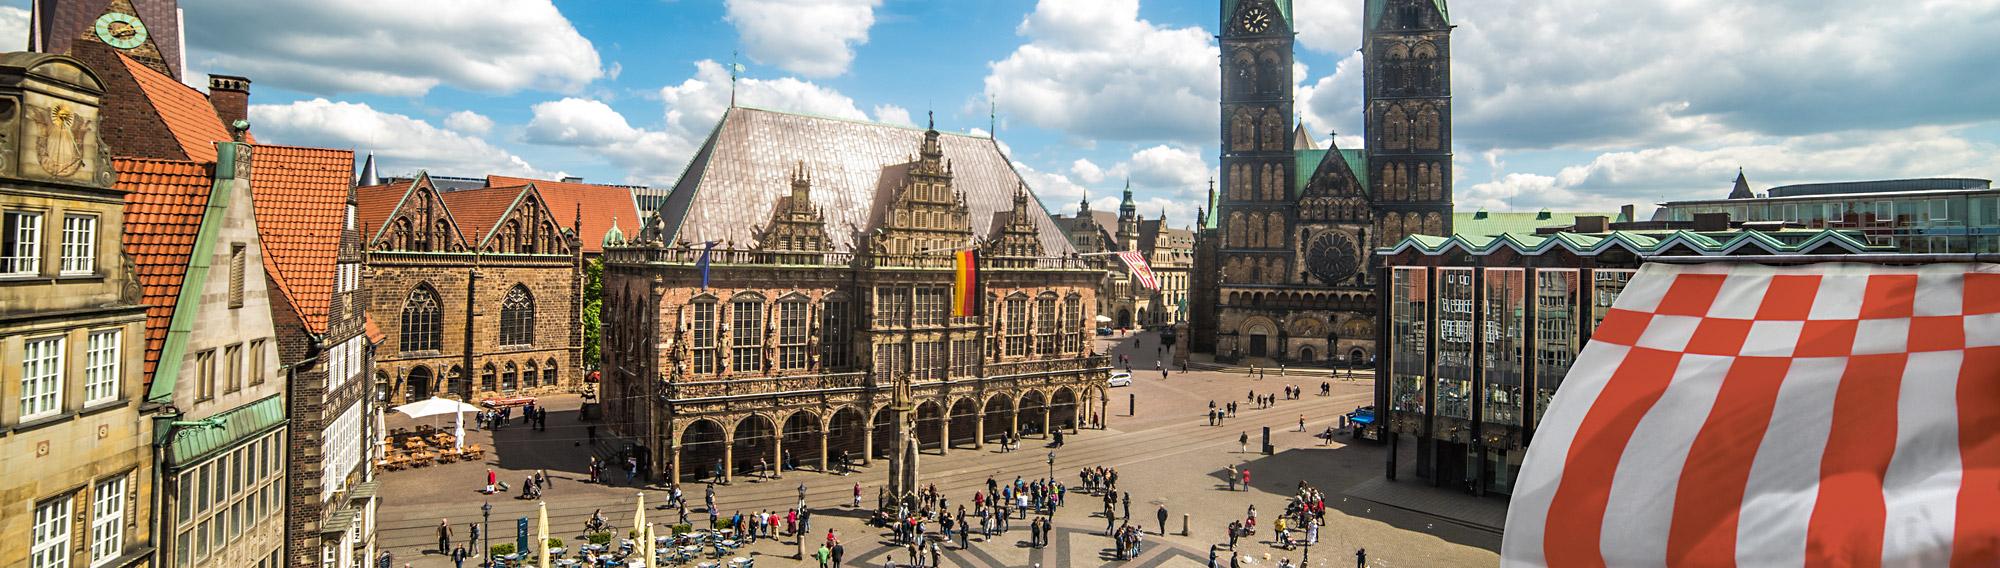 Bremer Marktplatz, Foto: Jonas Ginter / BTZ Bremer Touristik-Zentrale